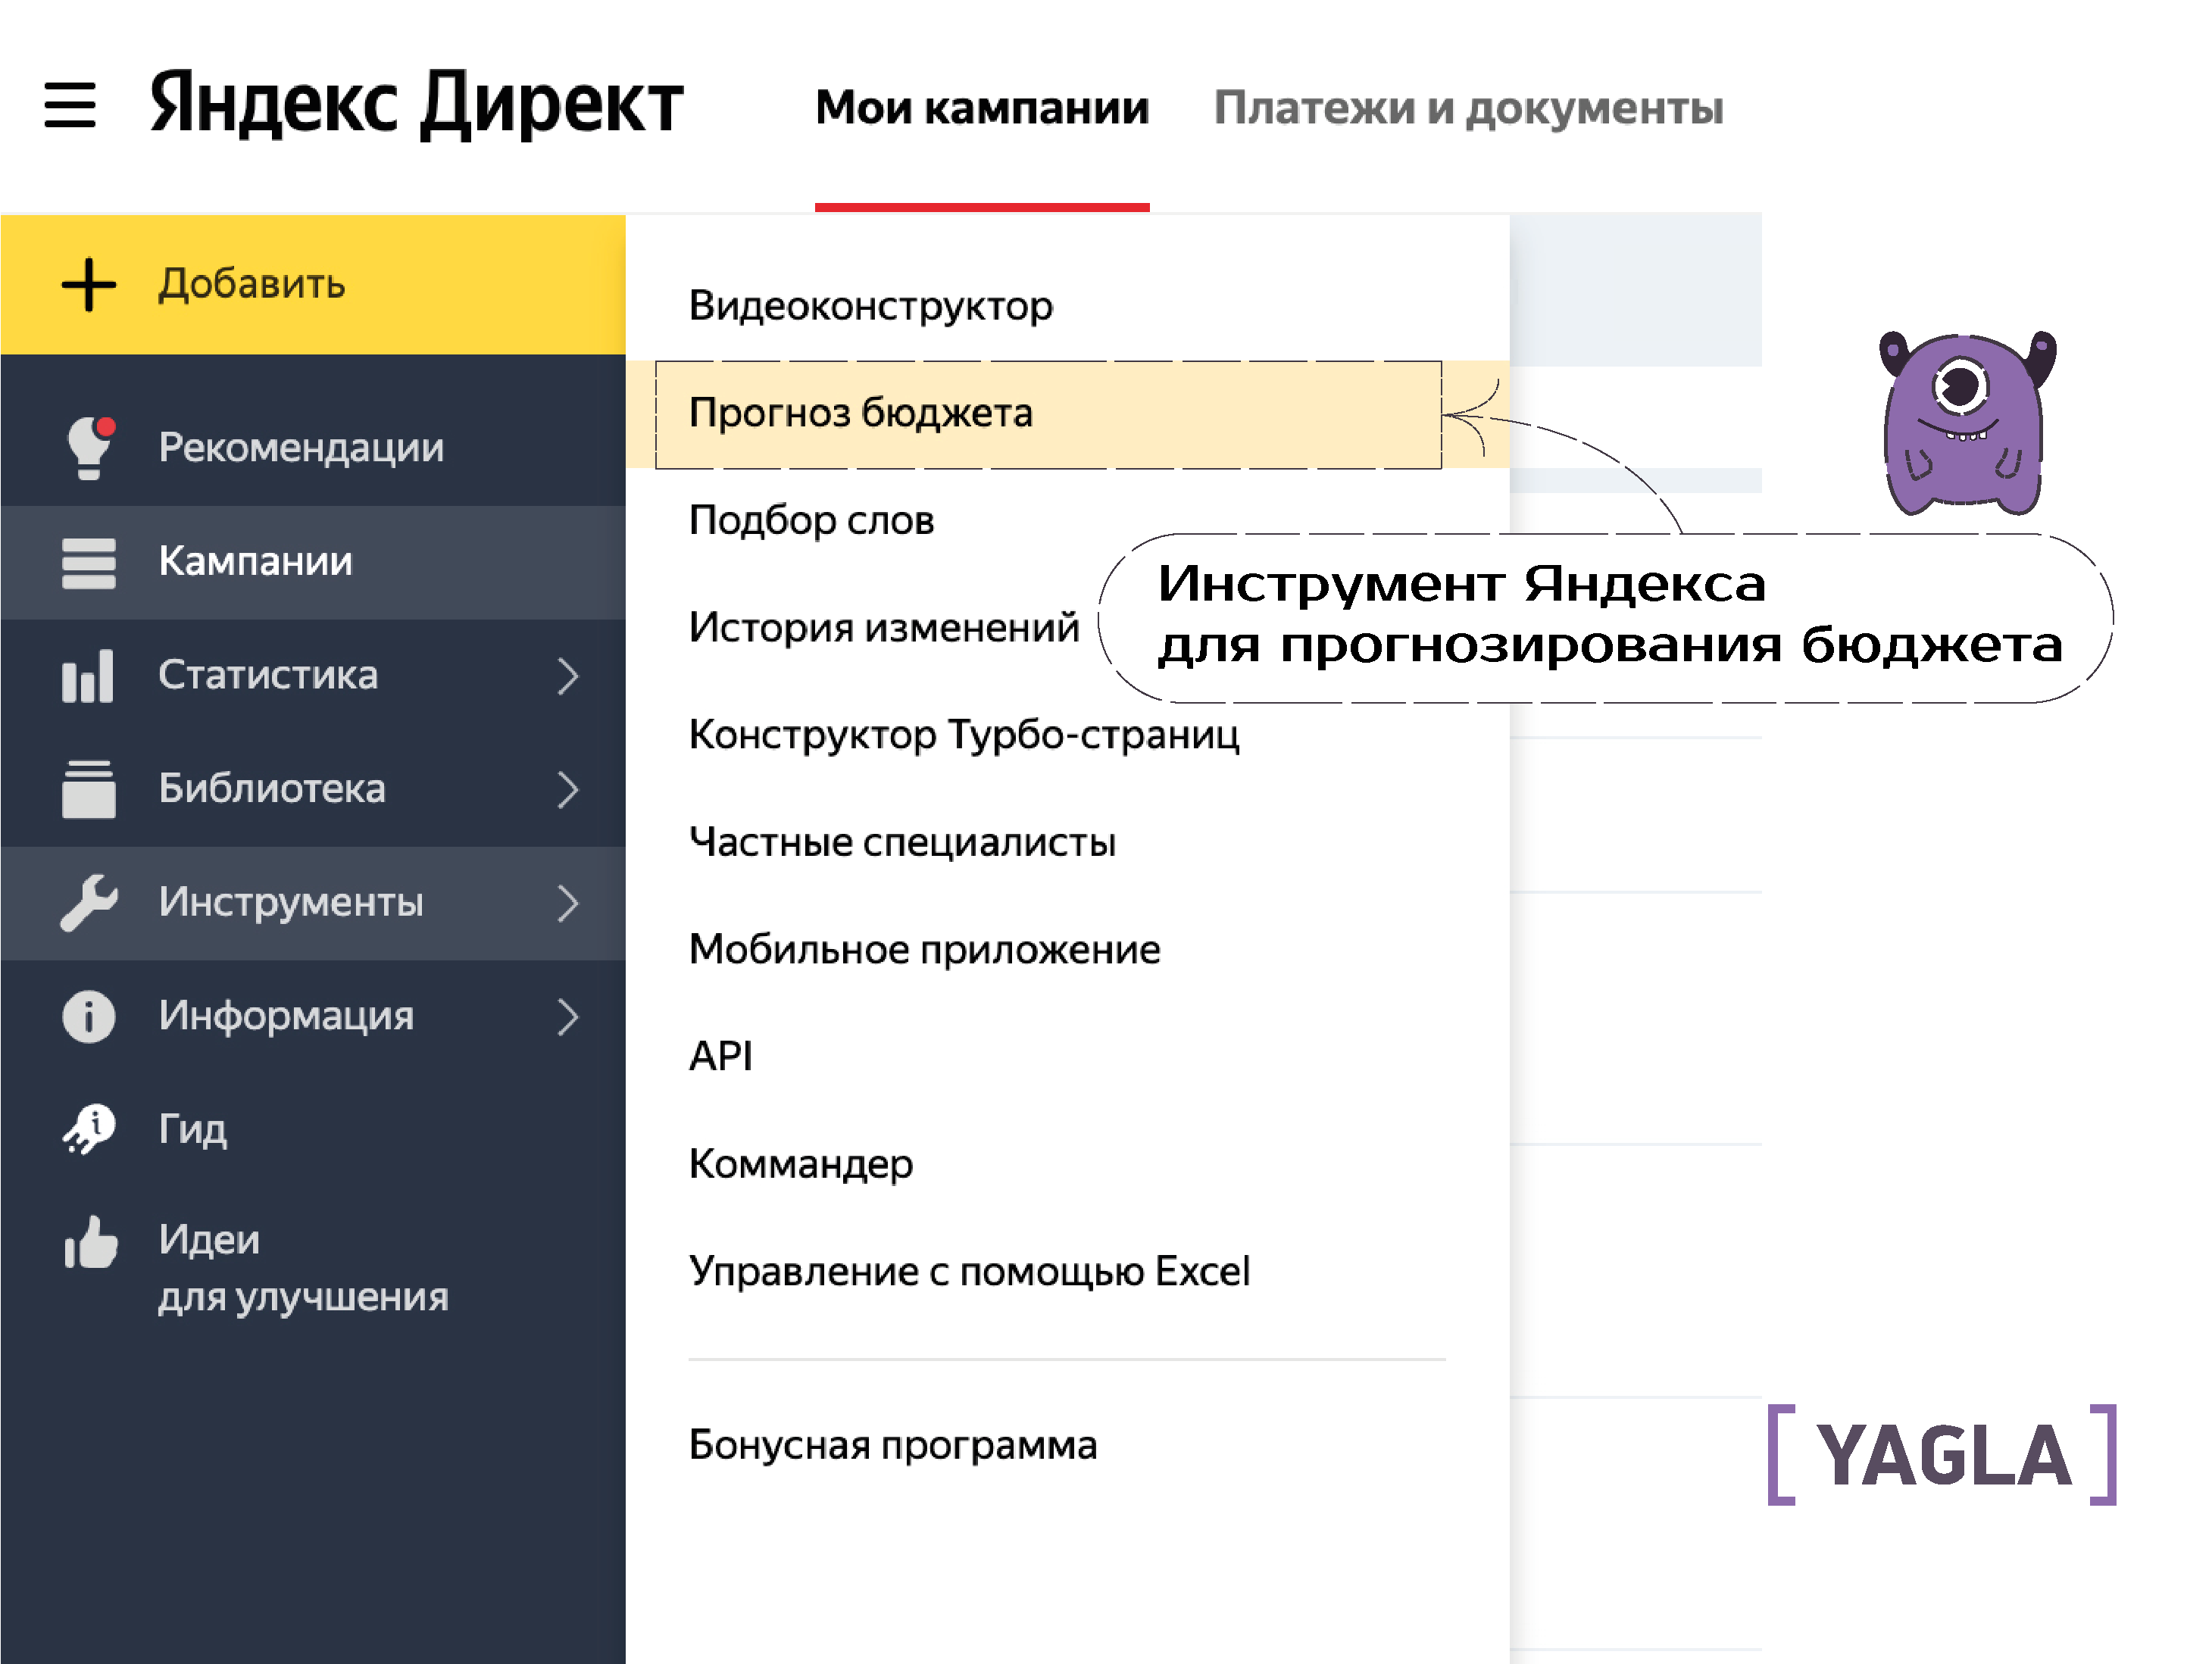 прогноз бюджета Яндекс.Директ